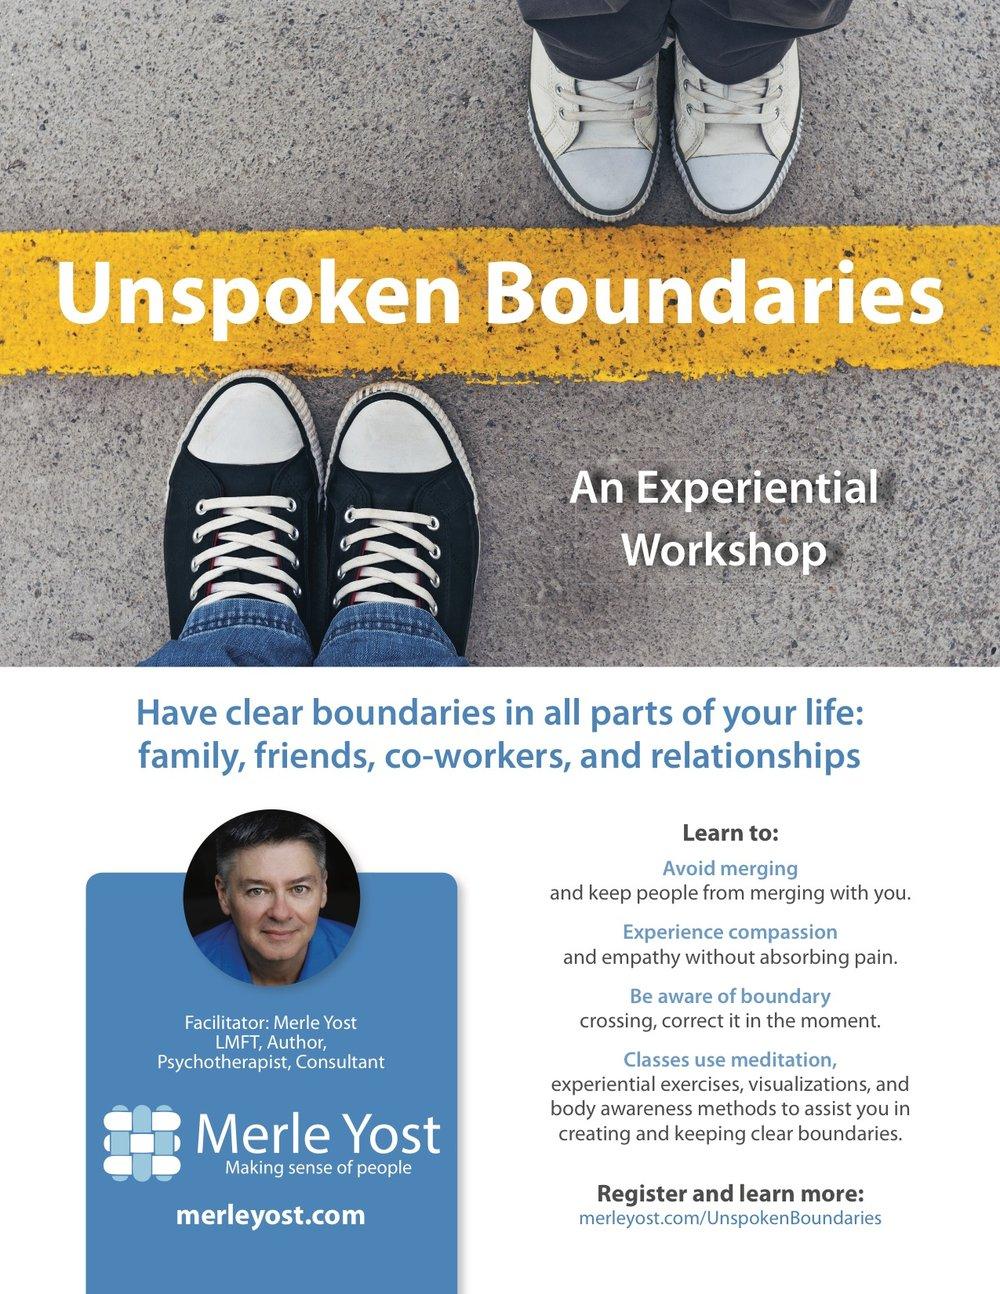 Unspoken-Boundaries.jpg